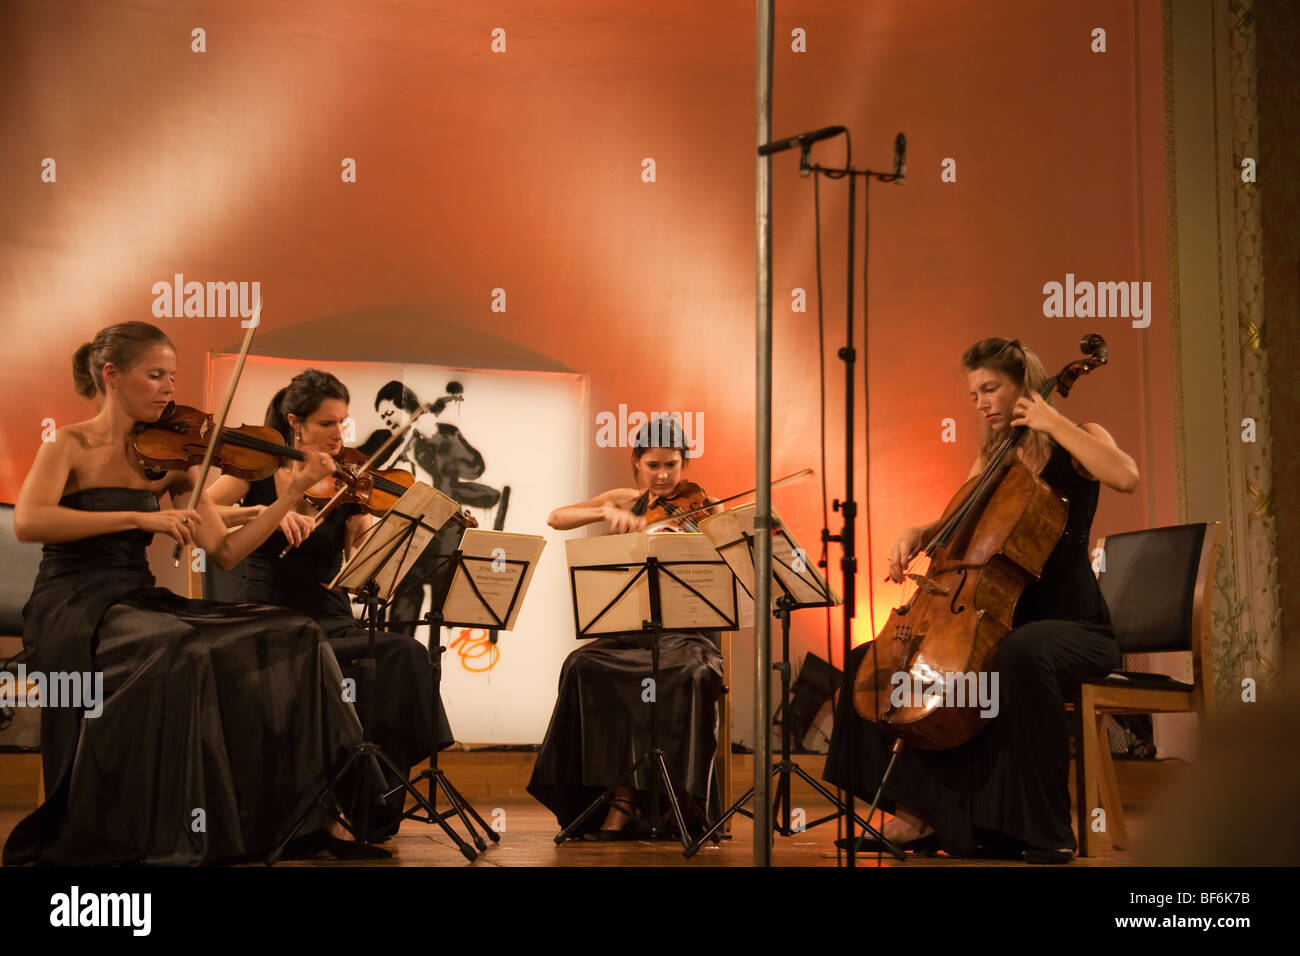 String quartet - Stock Image